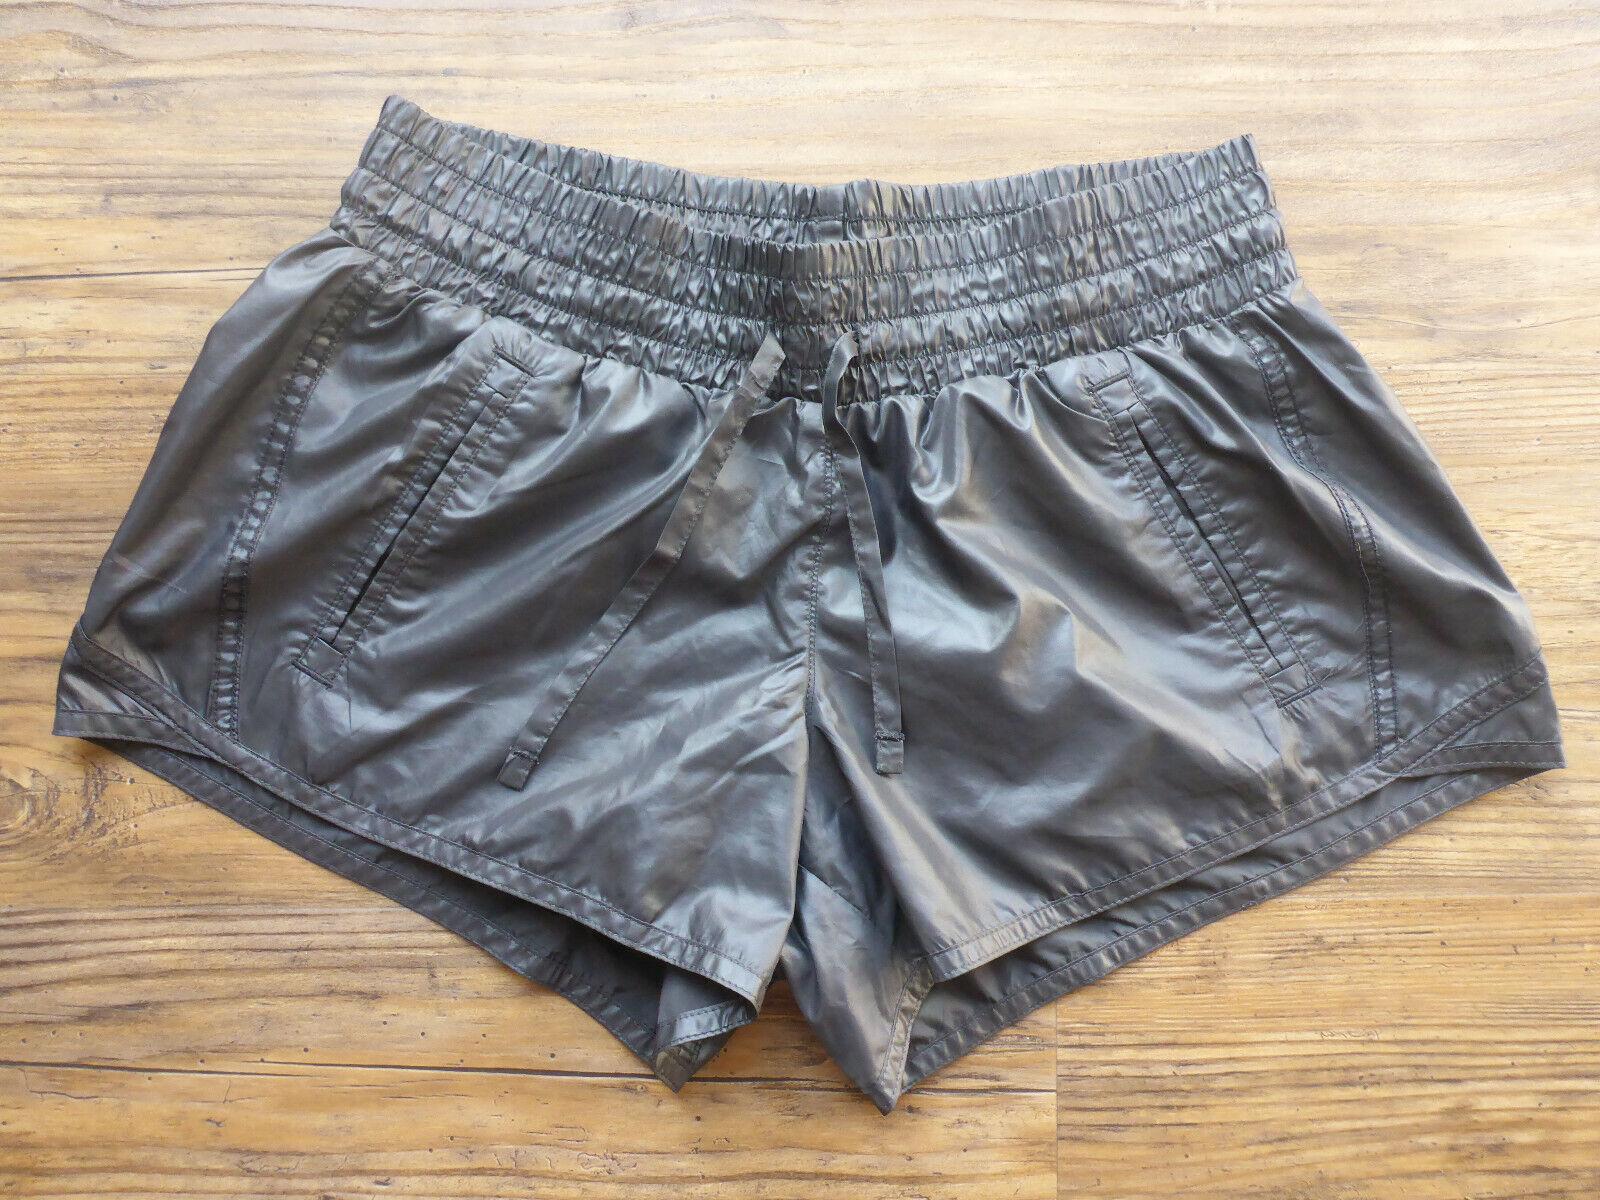 ADIDAS adizero Glanz Shorts Sporthose Running Laufhose Fittness 36 schwarz